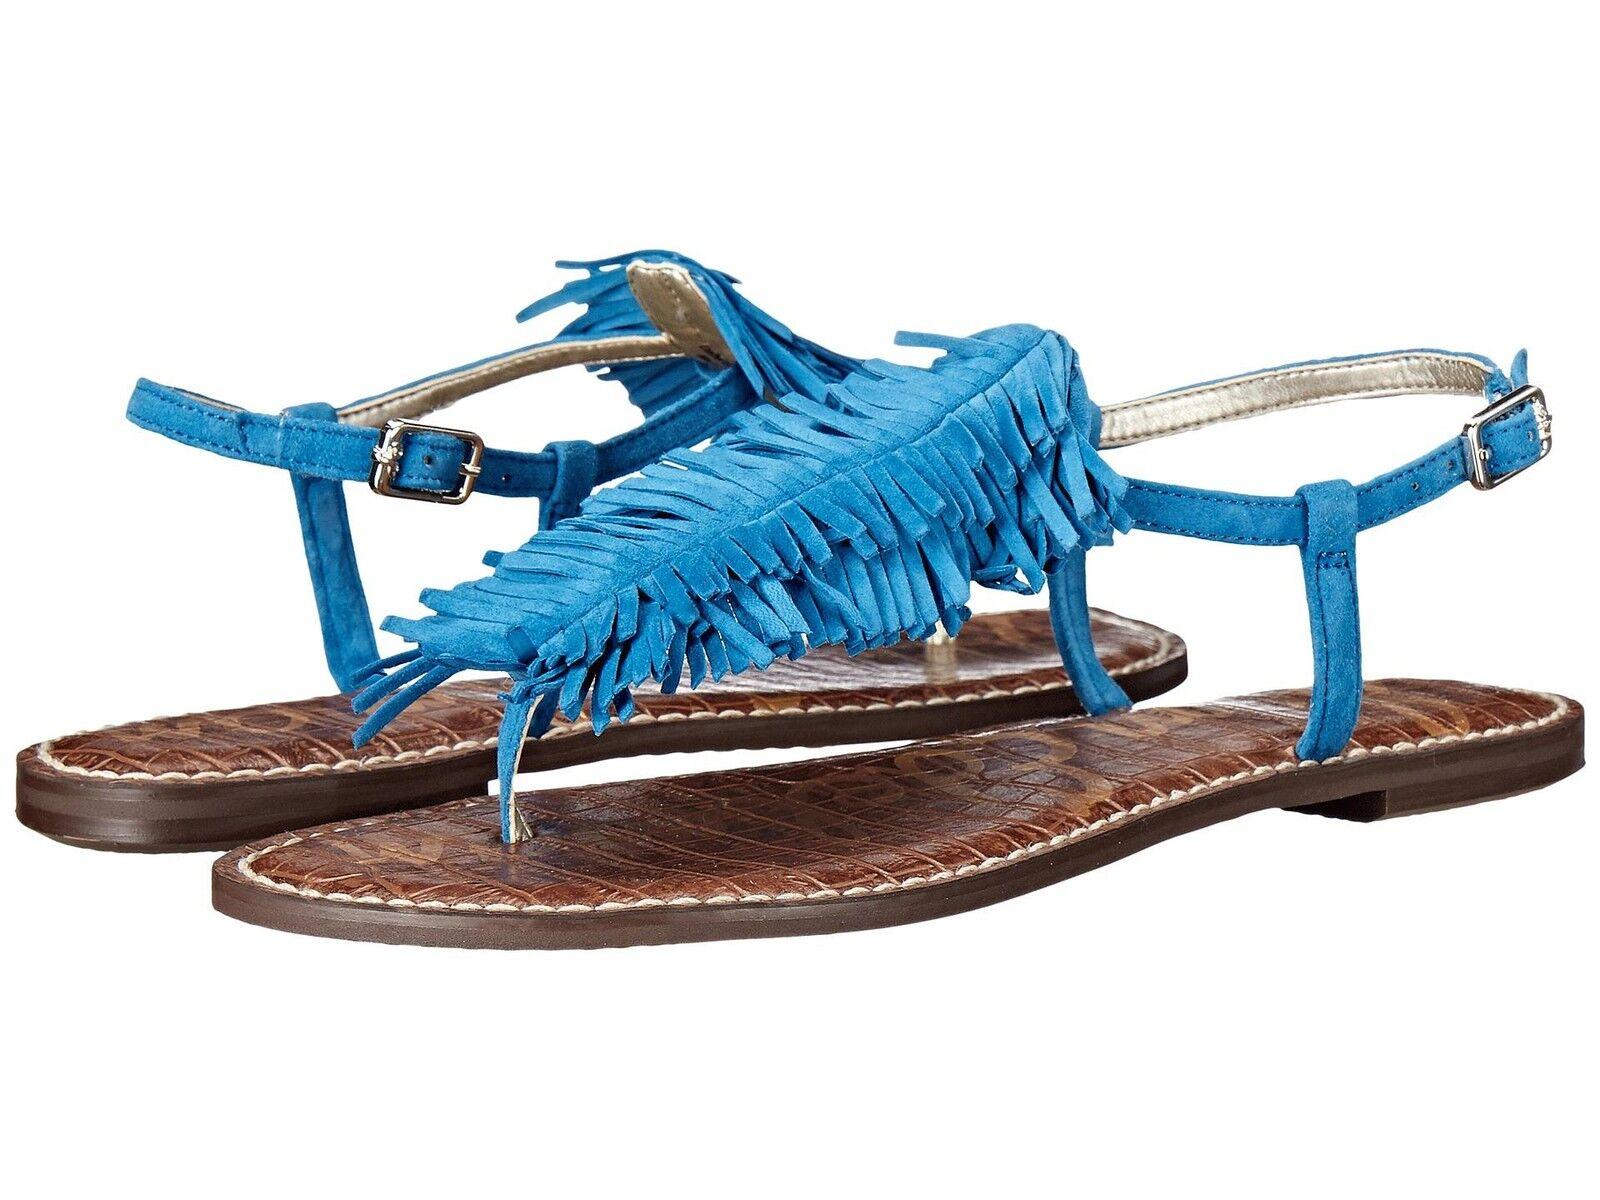 Sam Edelman Sandalias Mujer Boho Flequillos Gela Azul Talla 7 7 7 7.5 8 8.5 9 Nuevo  tienda en linea